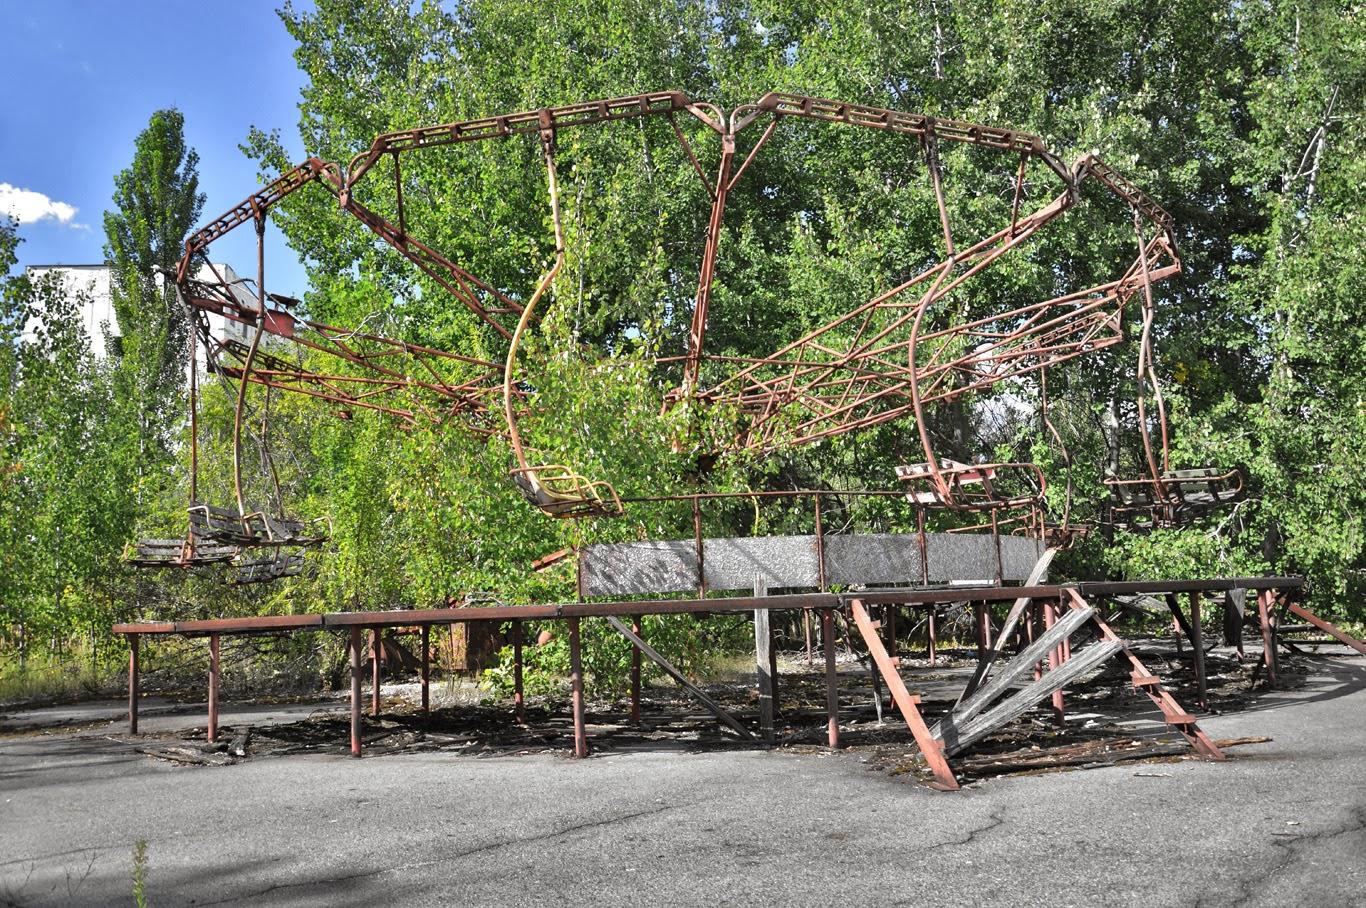 fanfair czernobyl prypeć